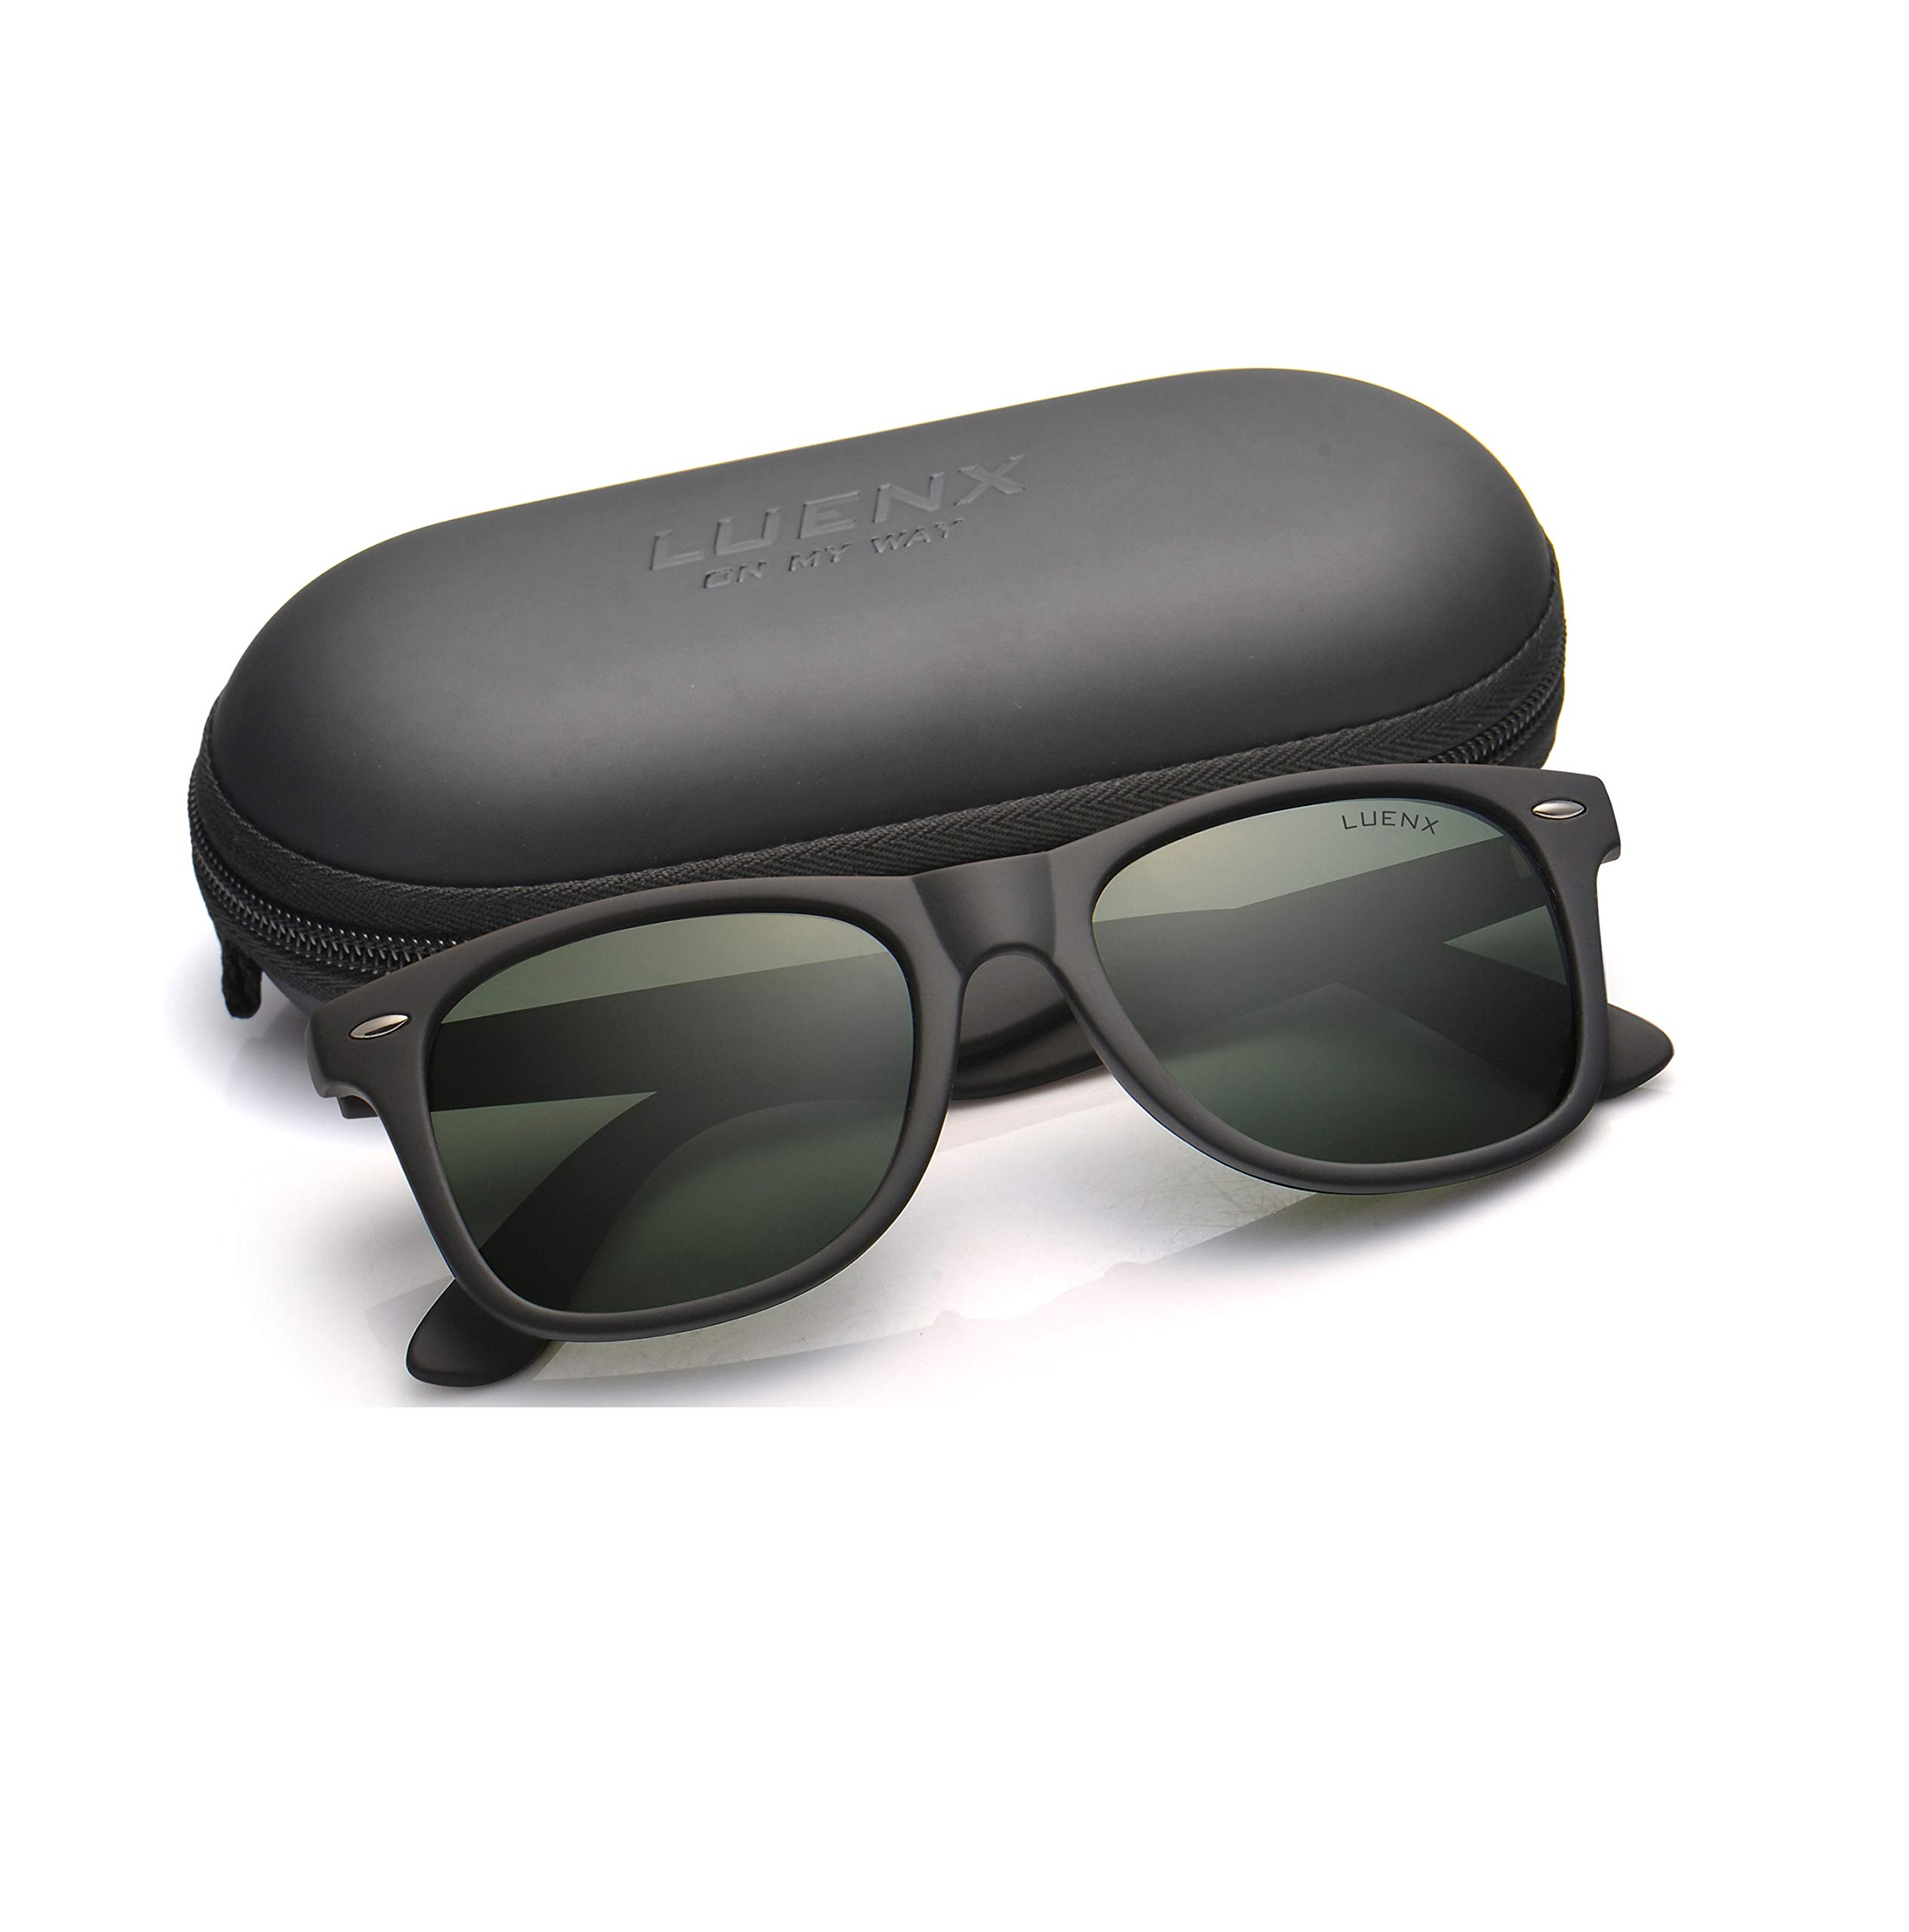 Mens Polarized Sunglasses for Womens UV 400 Protection Grey Green Lens Matte Black Frame 54MM by LUENX